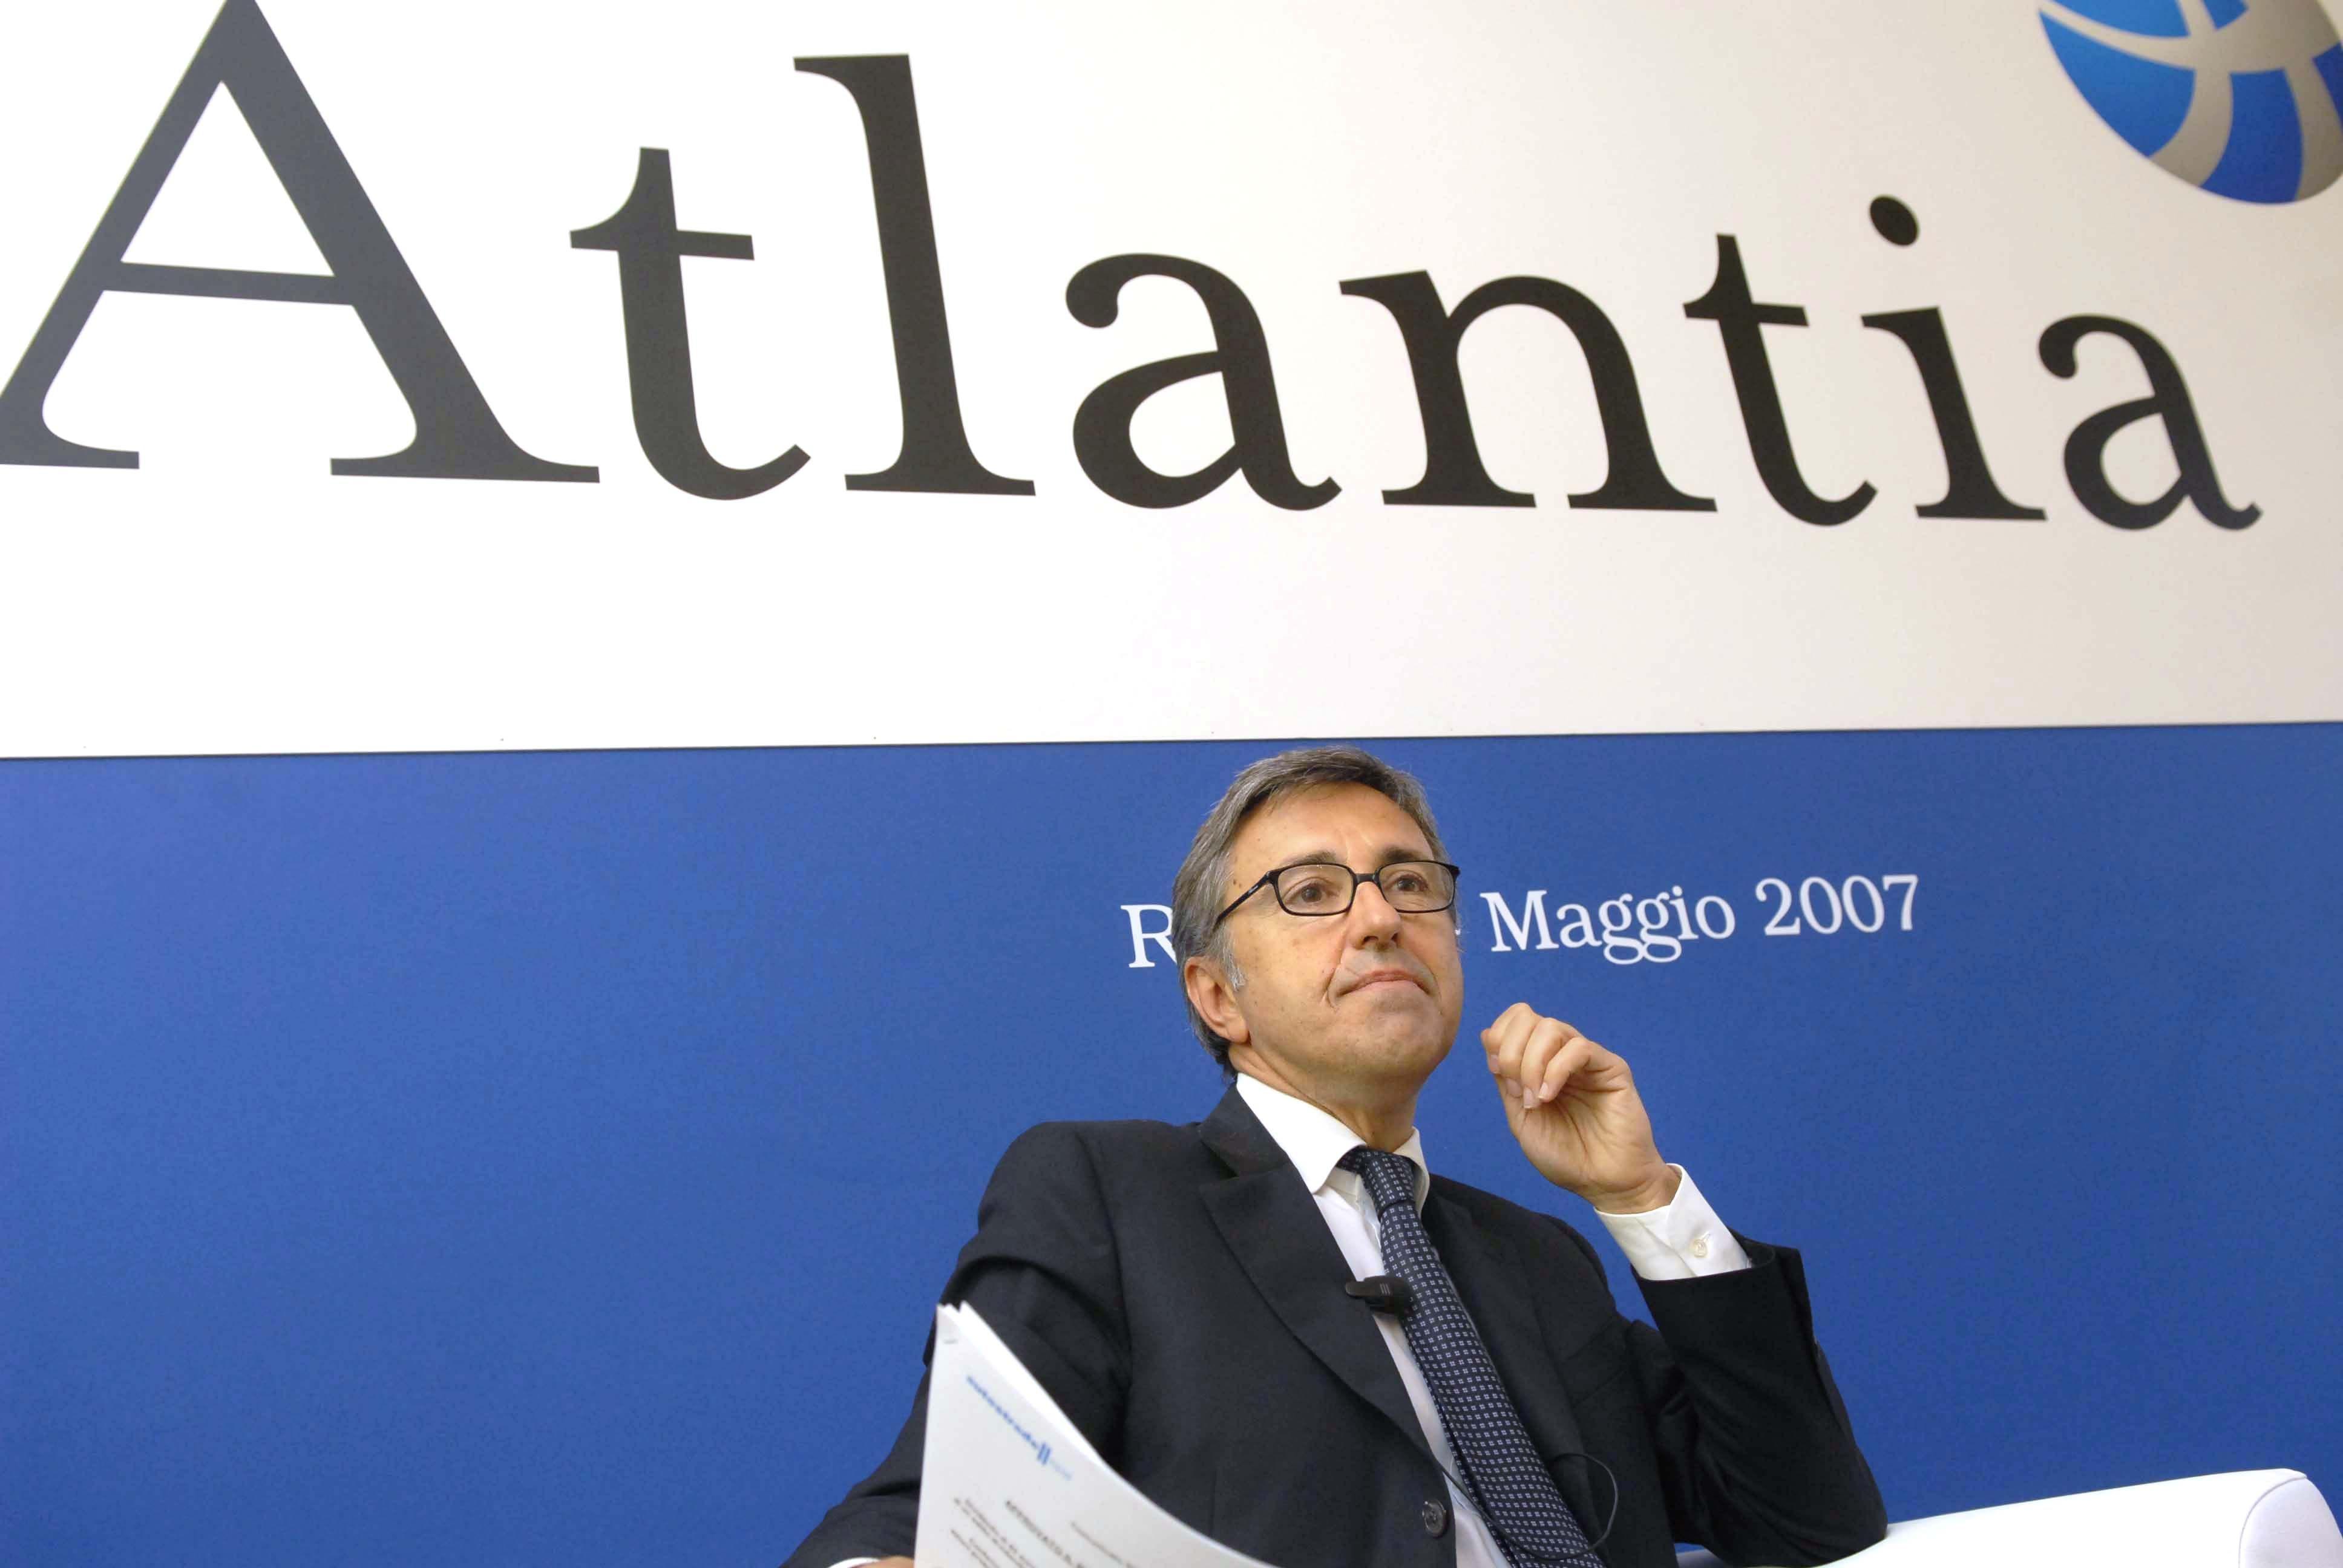 Atlantia: opas Abertis a novembre, potenziale +30% per dividendi